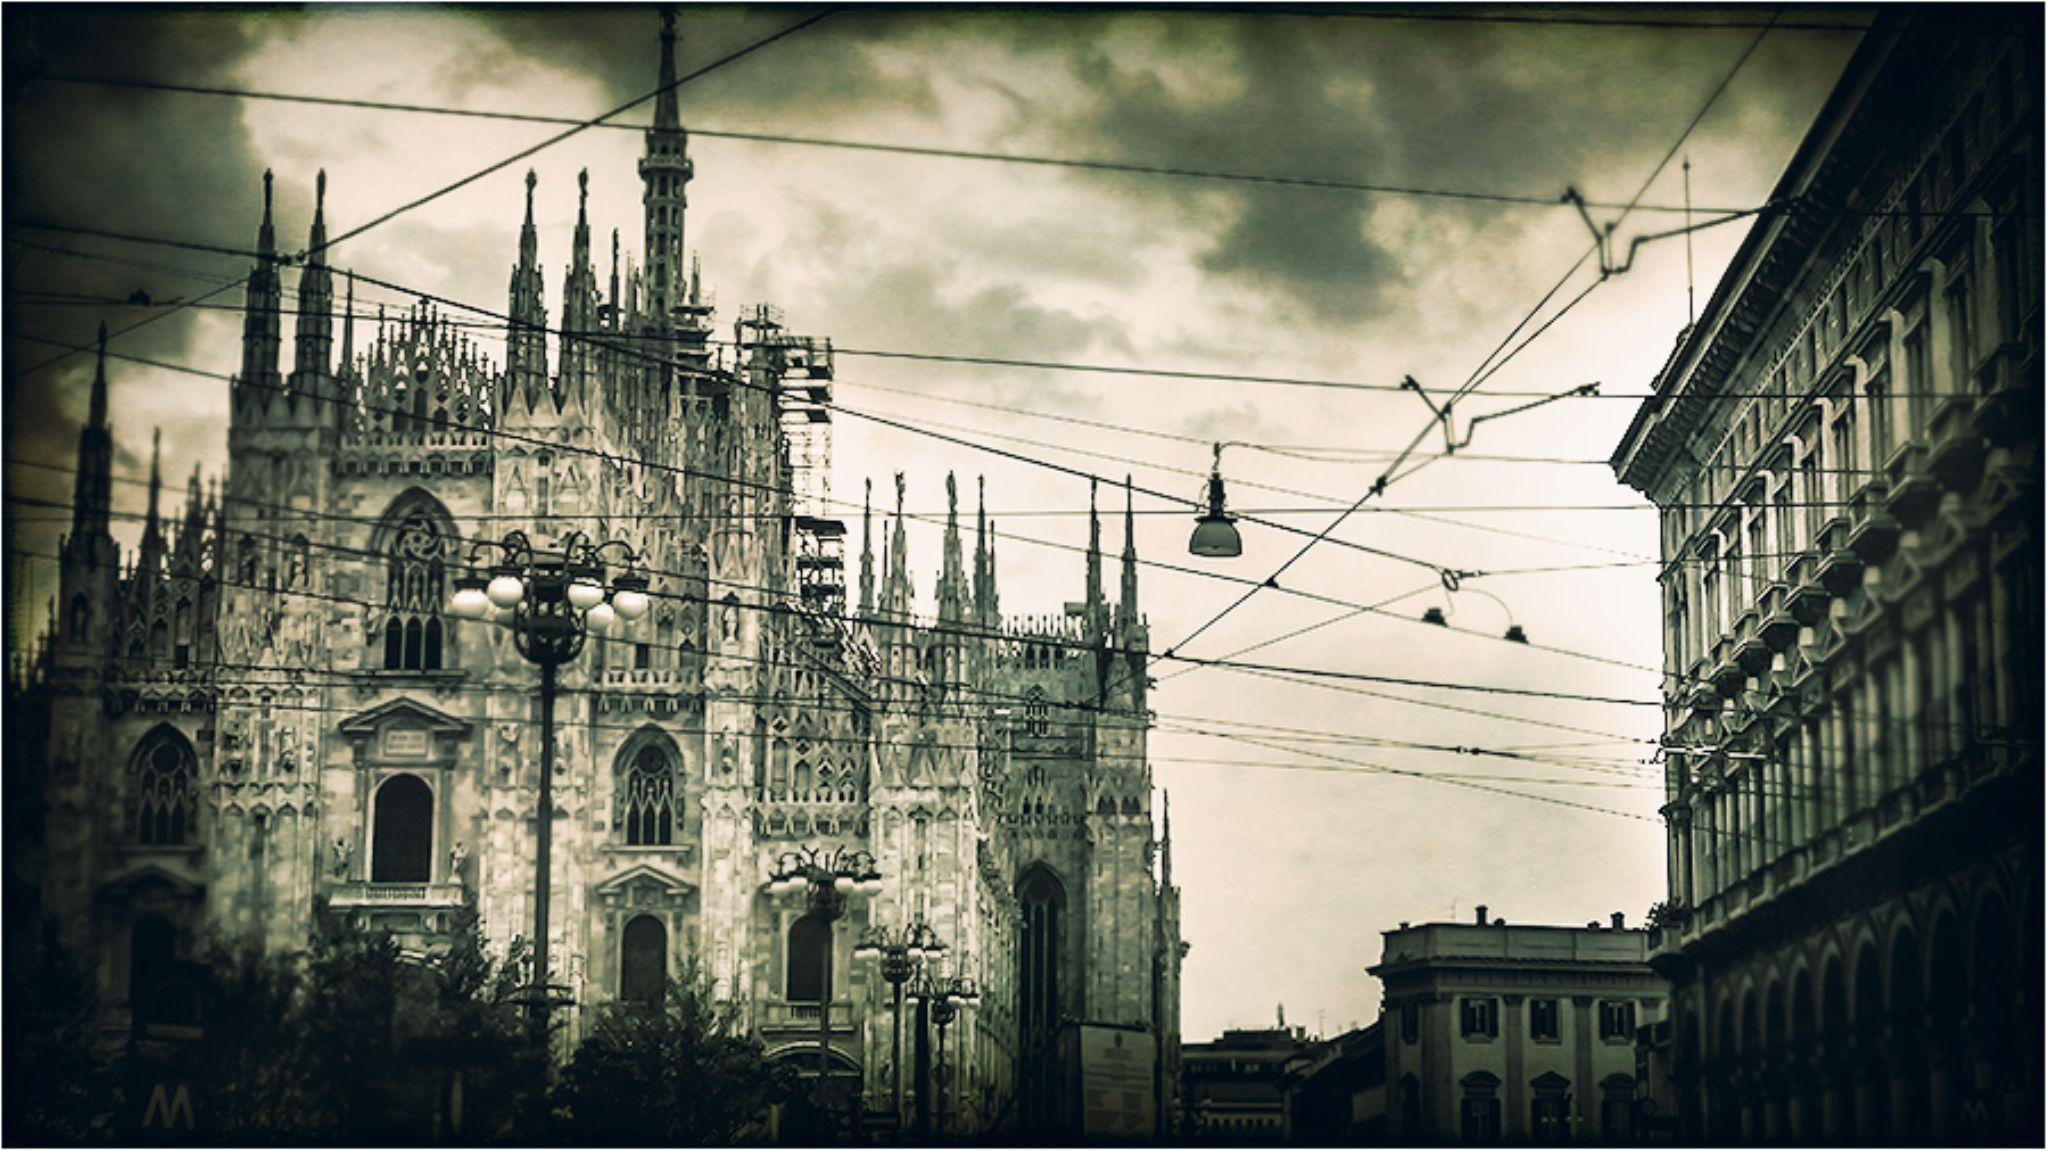 Milan by claudio naboni